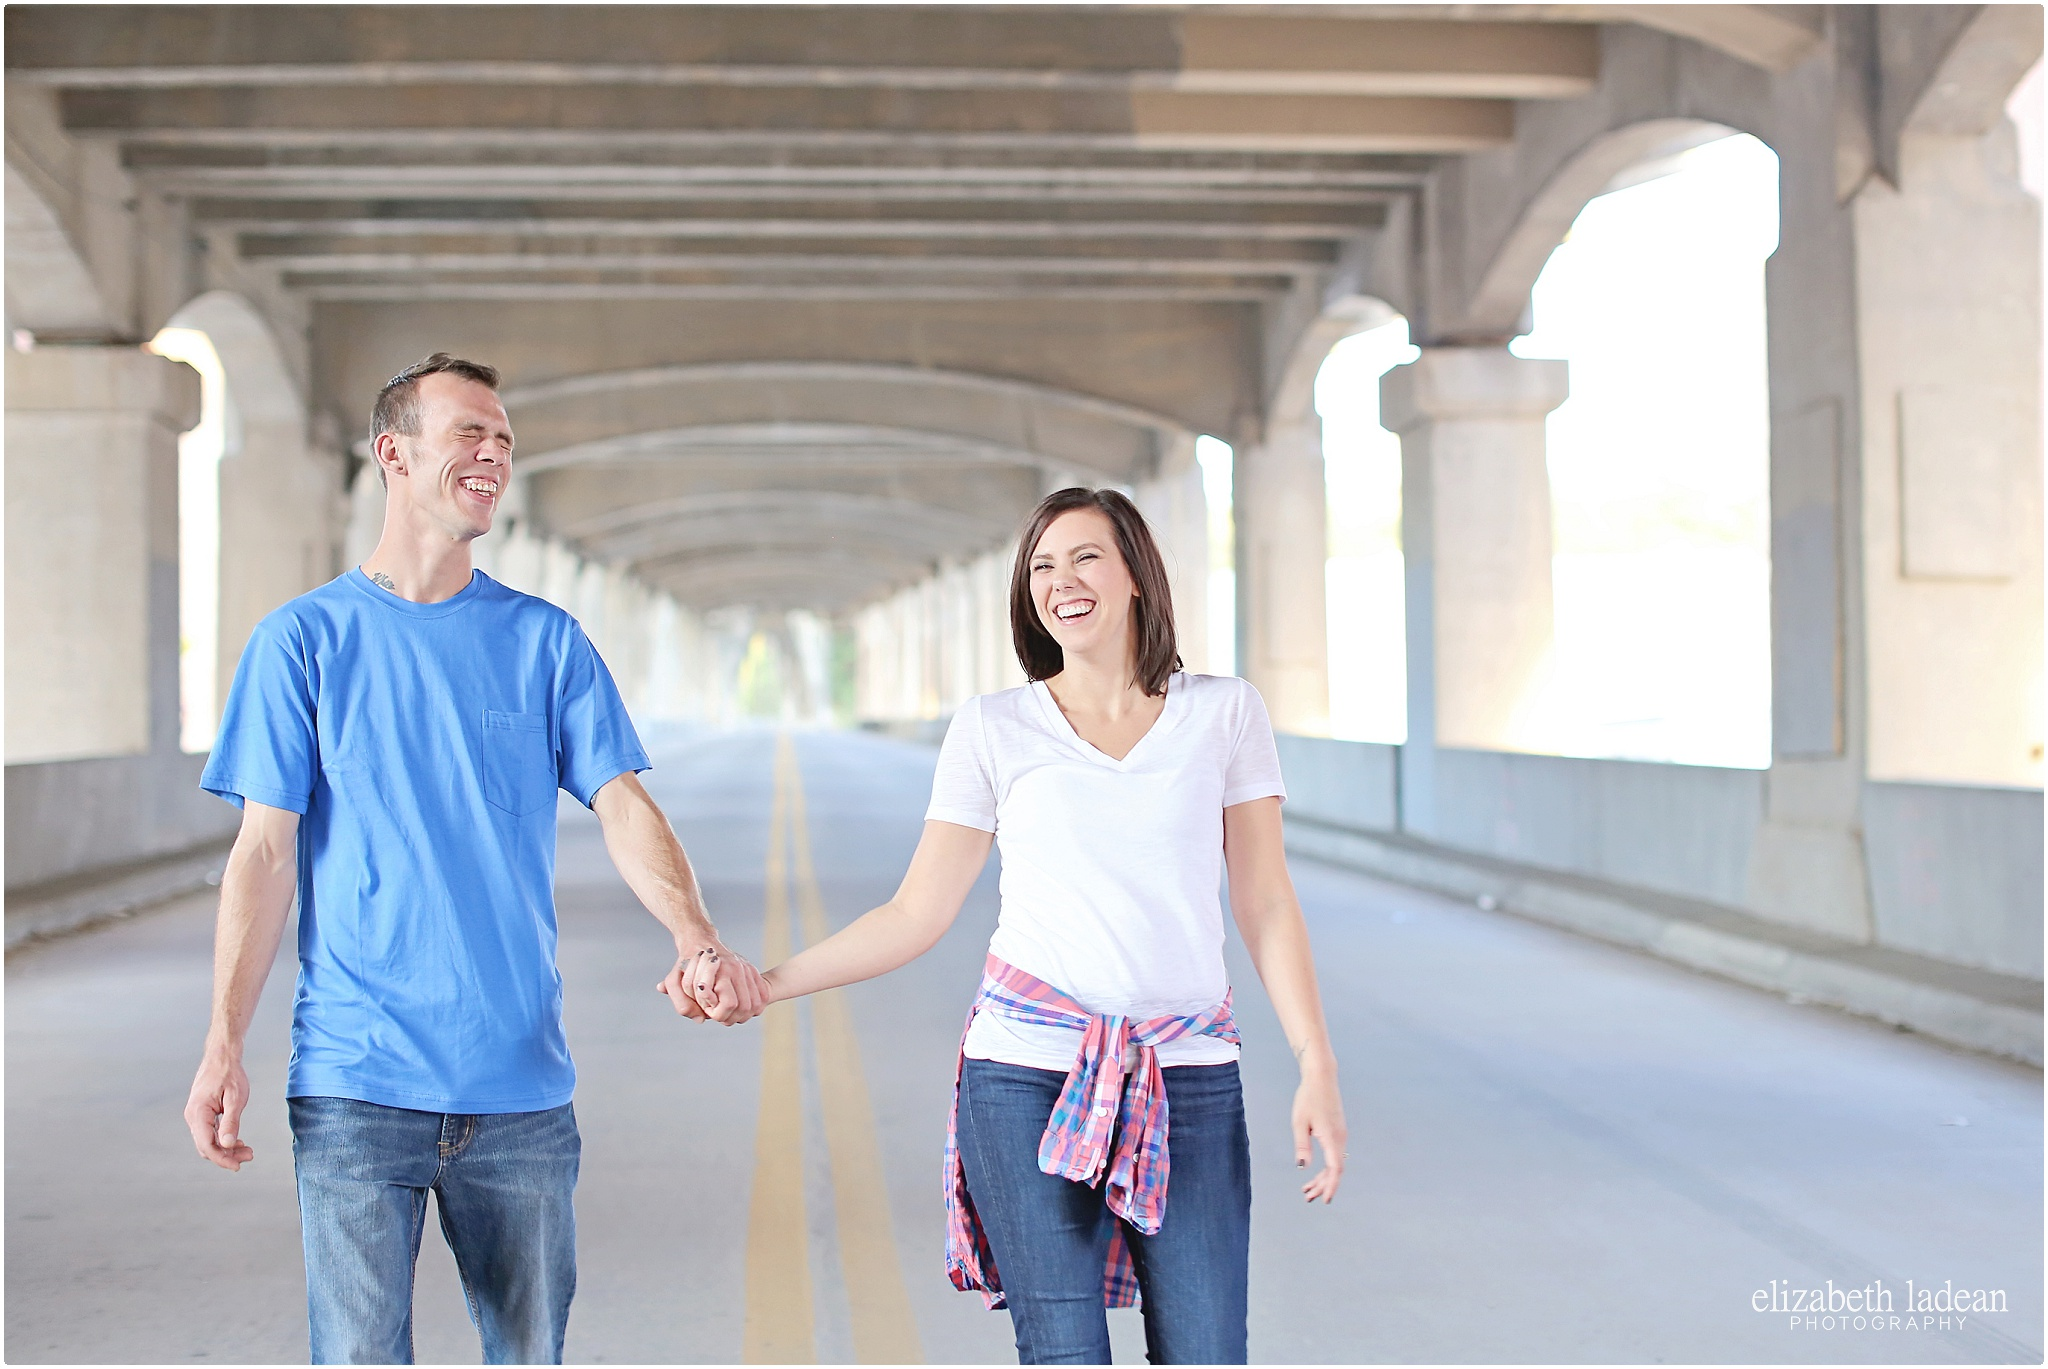 West-Bottoms-Downtown-Kansas-City-Urban-engagement-photos-M+C01-Elizabeth-Ladean-Photography-photo_7275.jpg